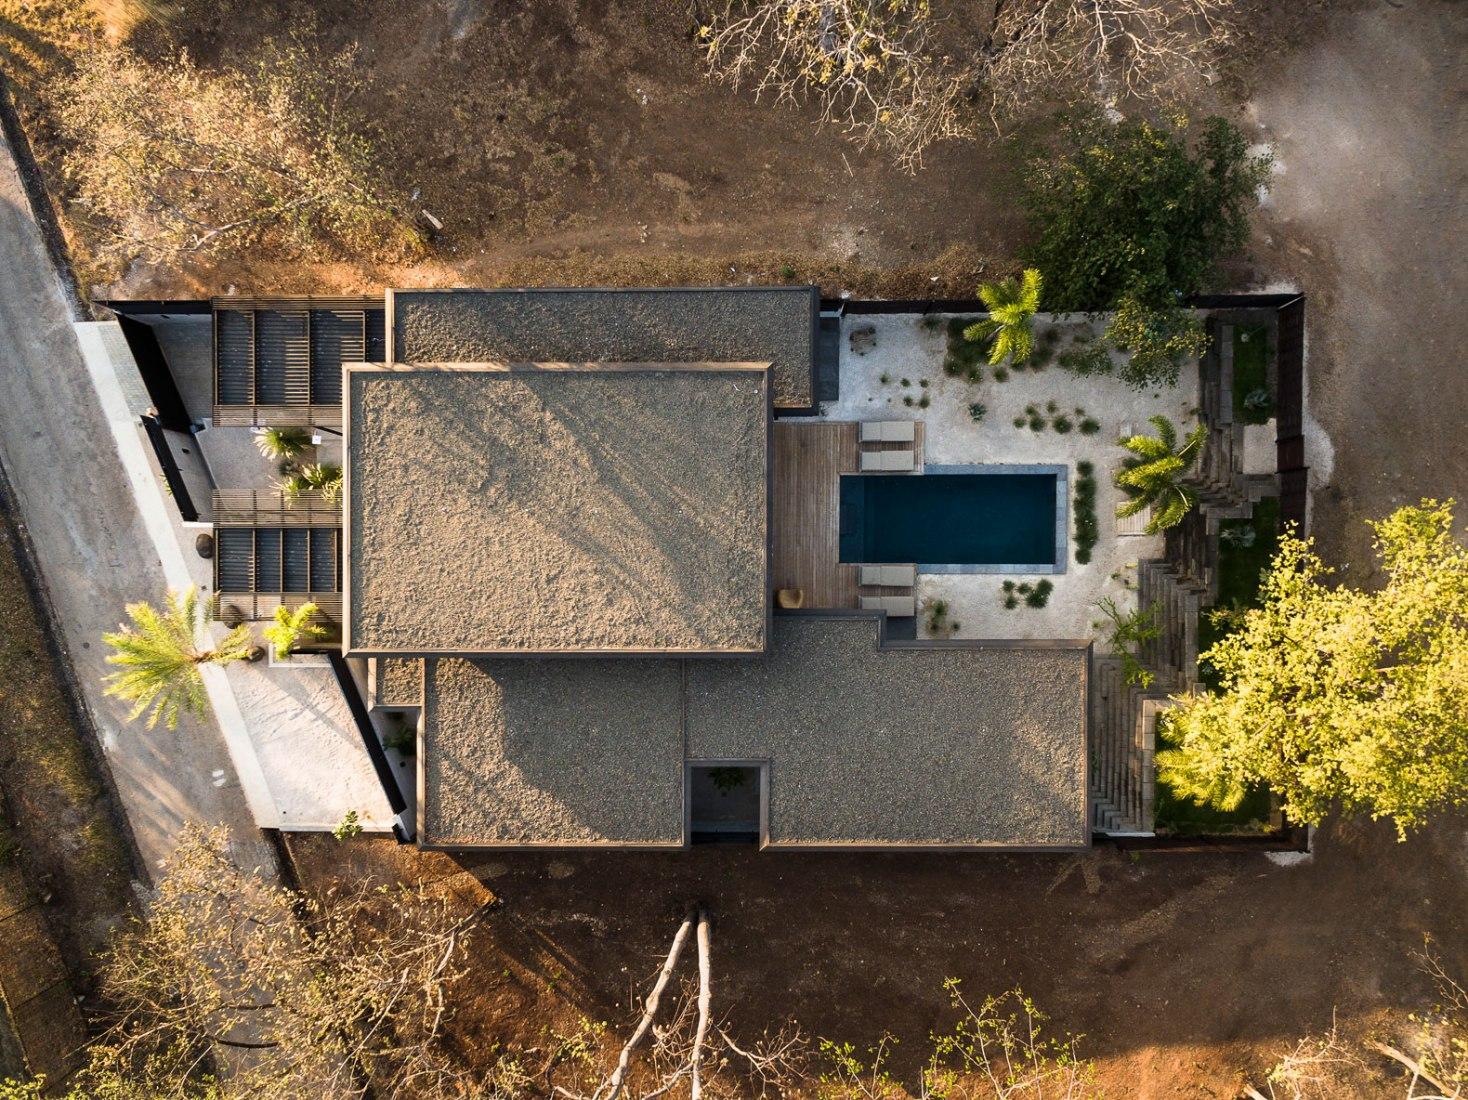 Overview. Villa Monoi by OsArq. Photograph by Fernando Alda.